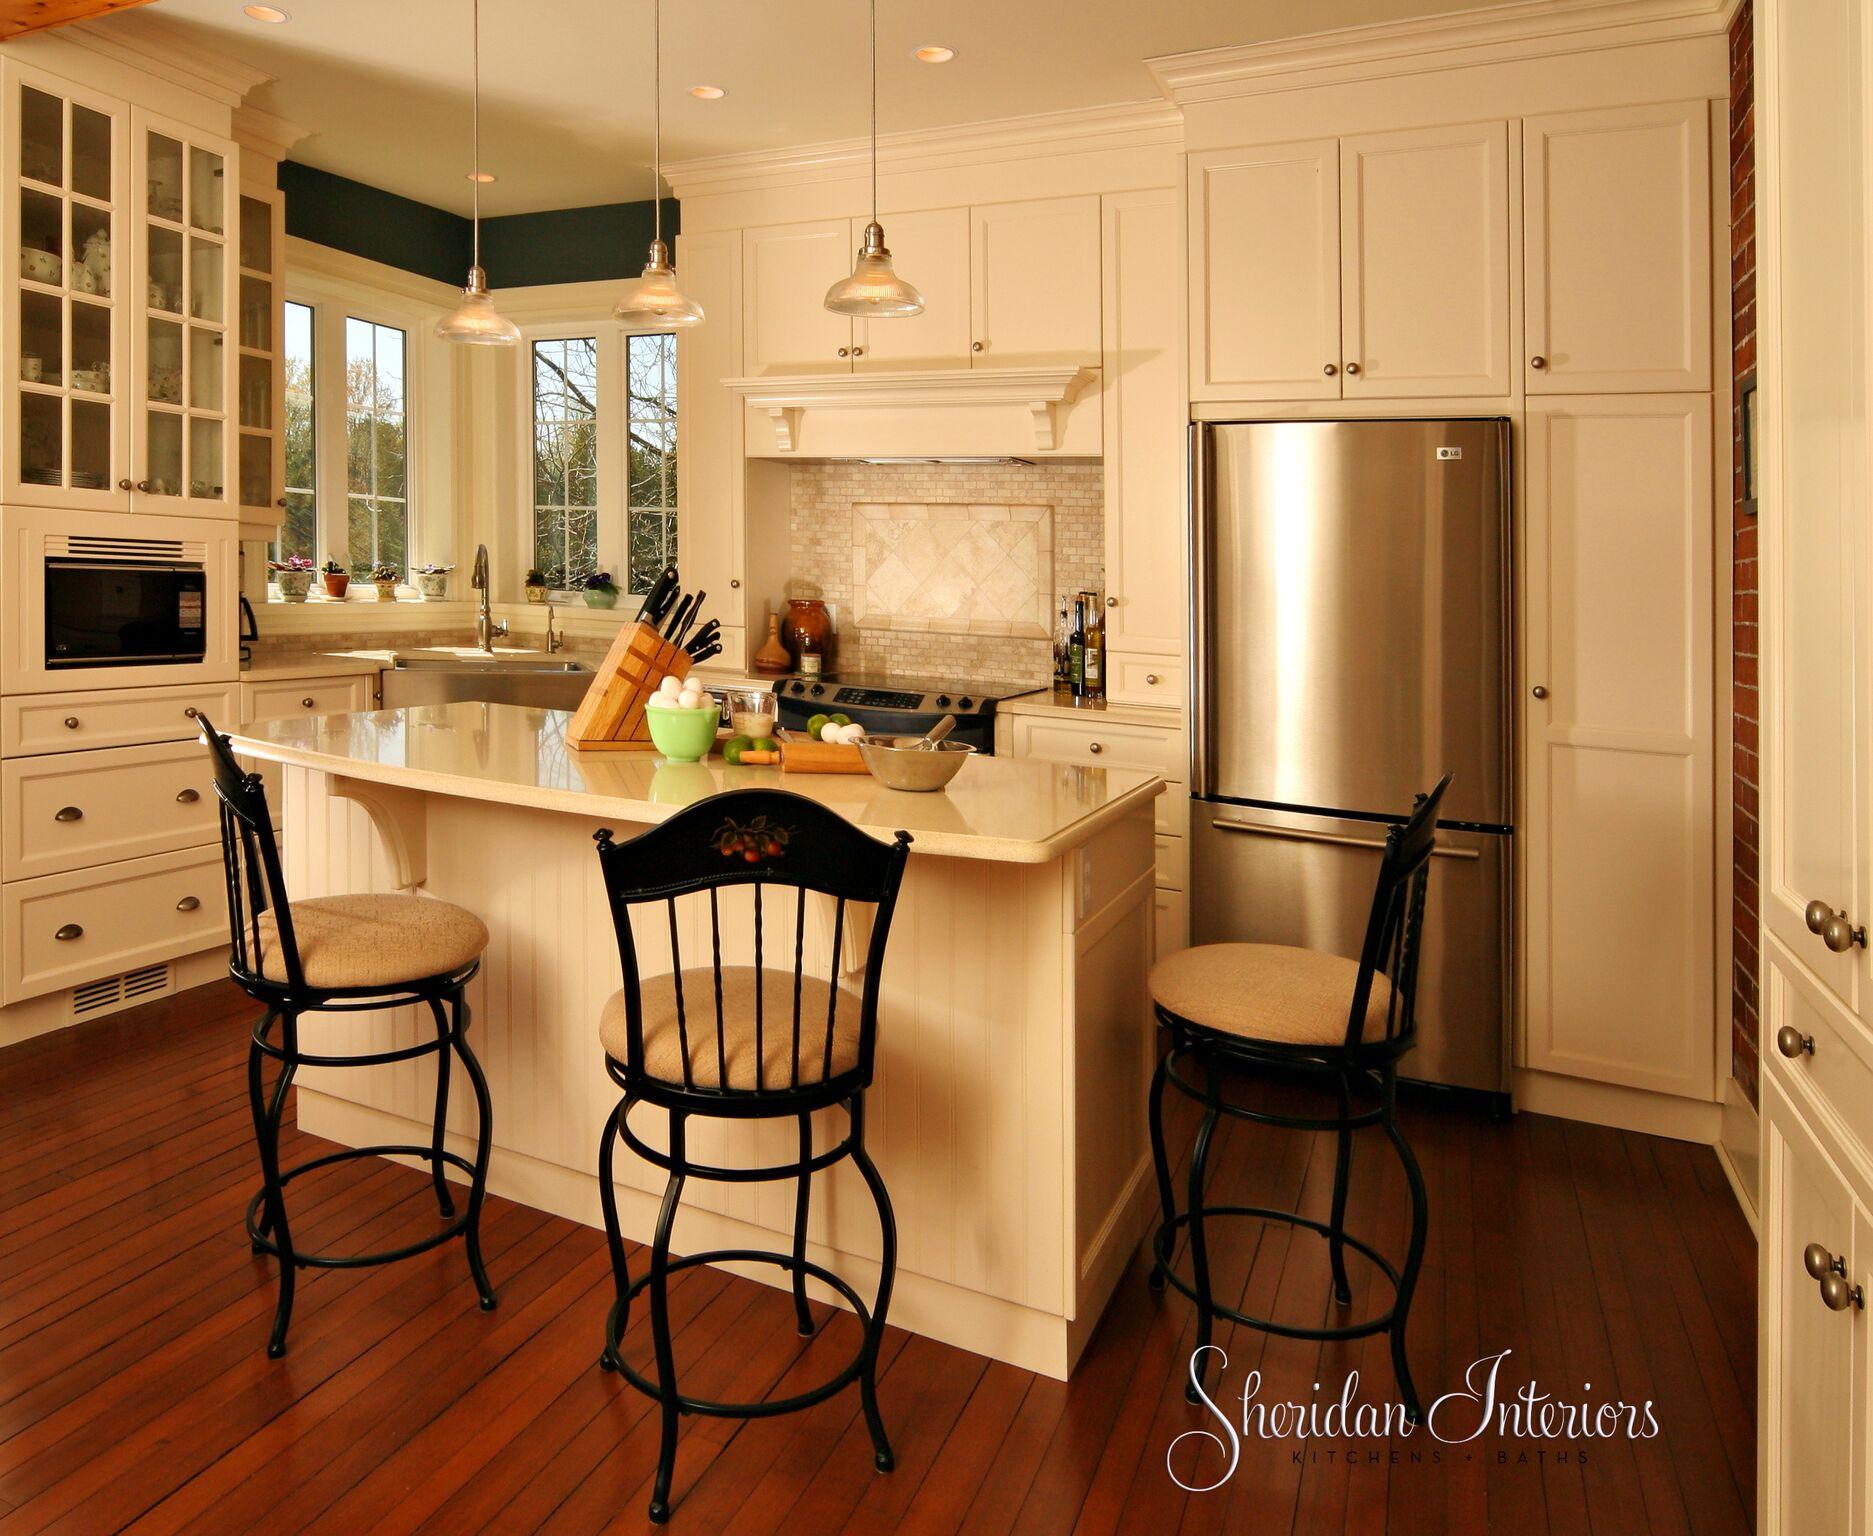 Country Kitchen - Sheridan Interiors